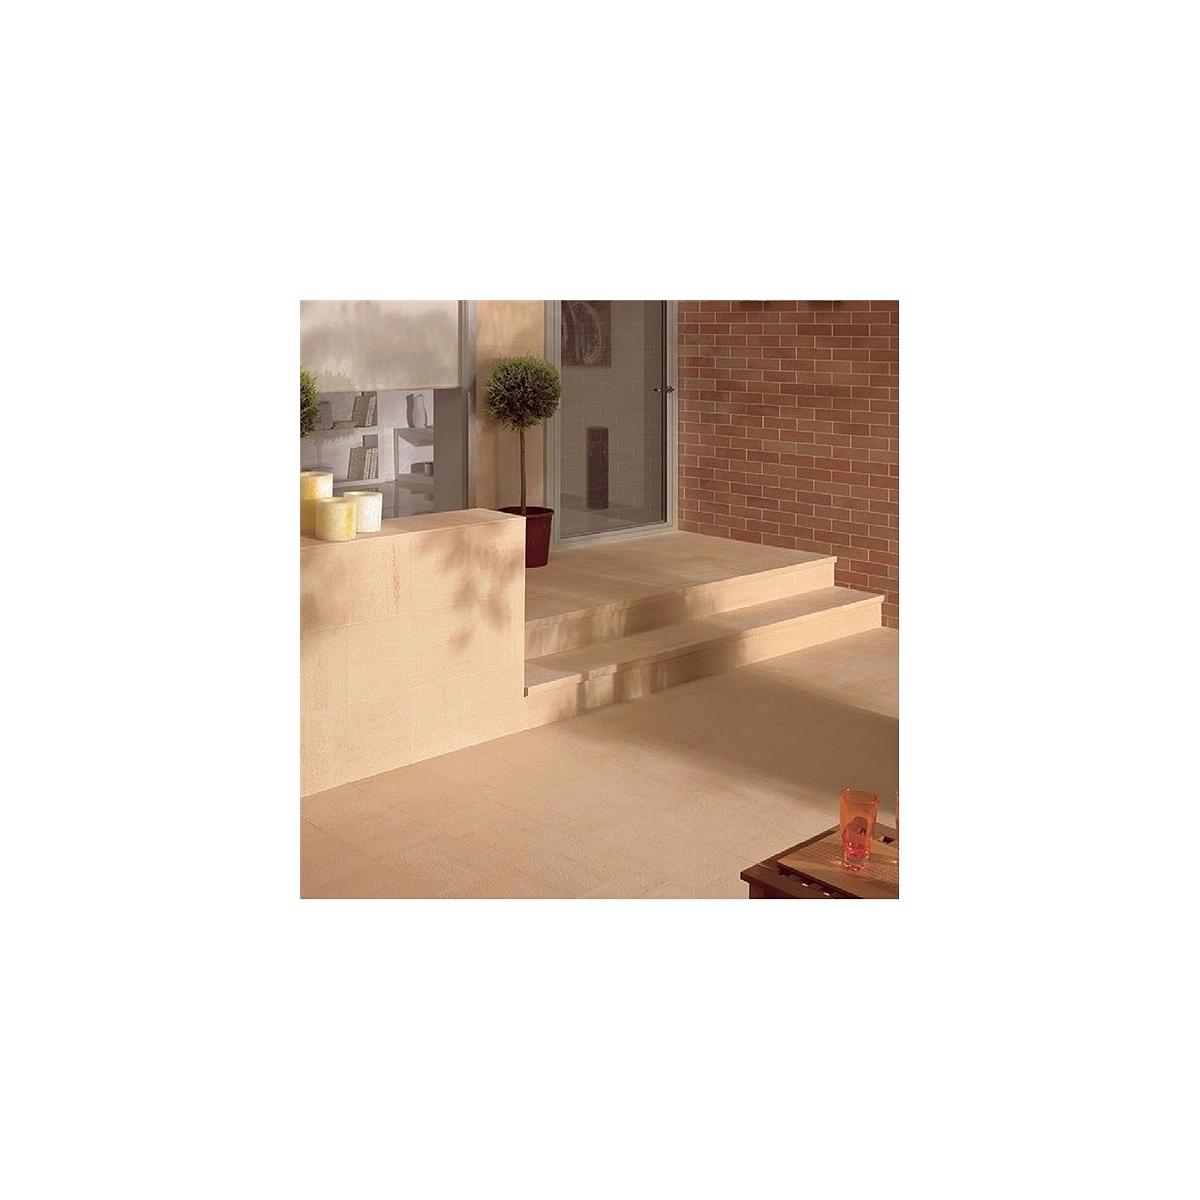 Base Arena Grain 40x40 - Colección Venatto - Bordes de piscina - Marca GrecoGres